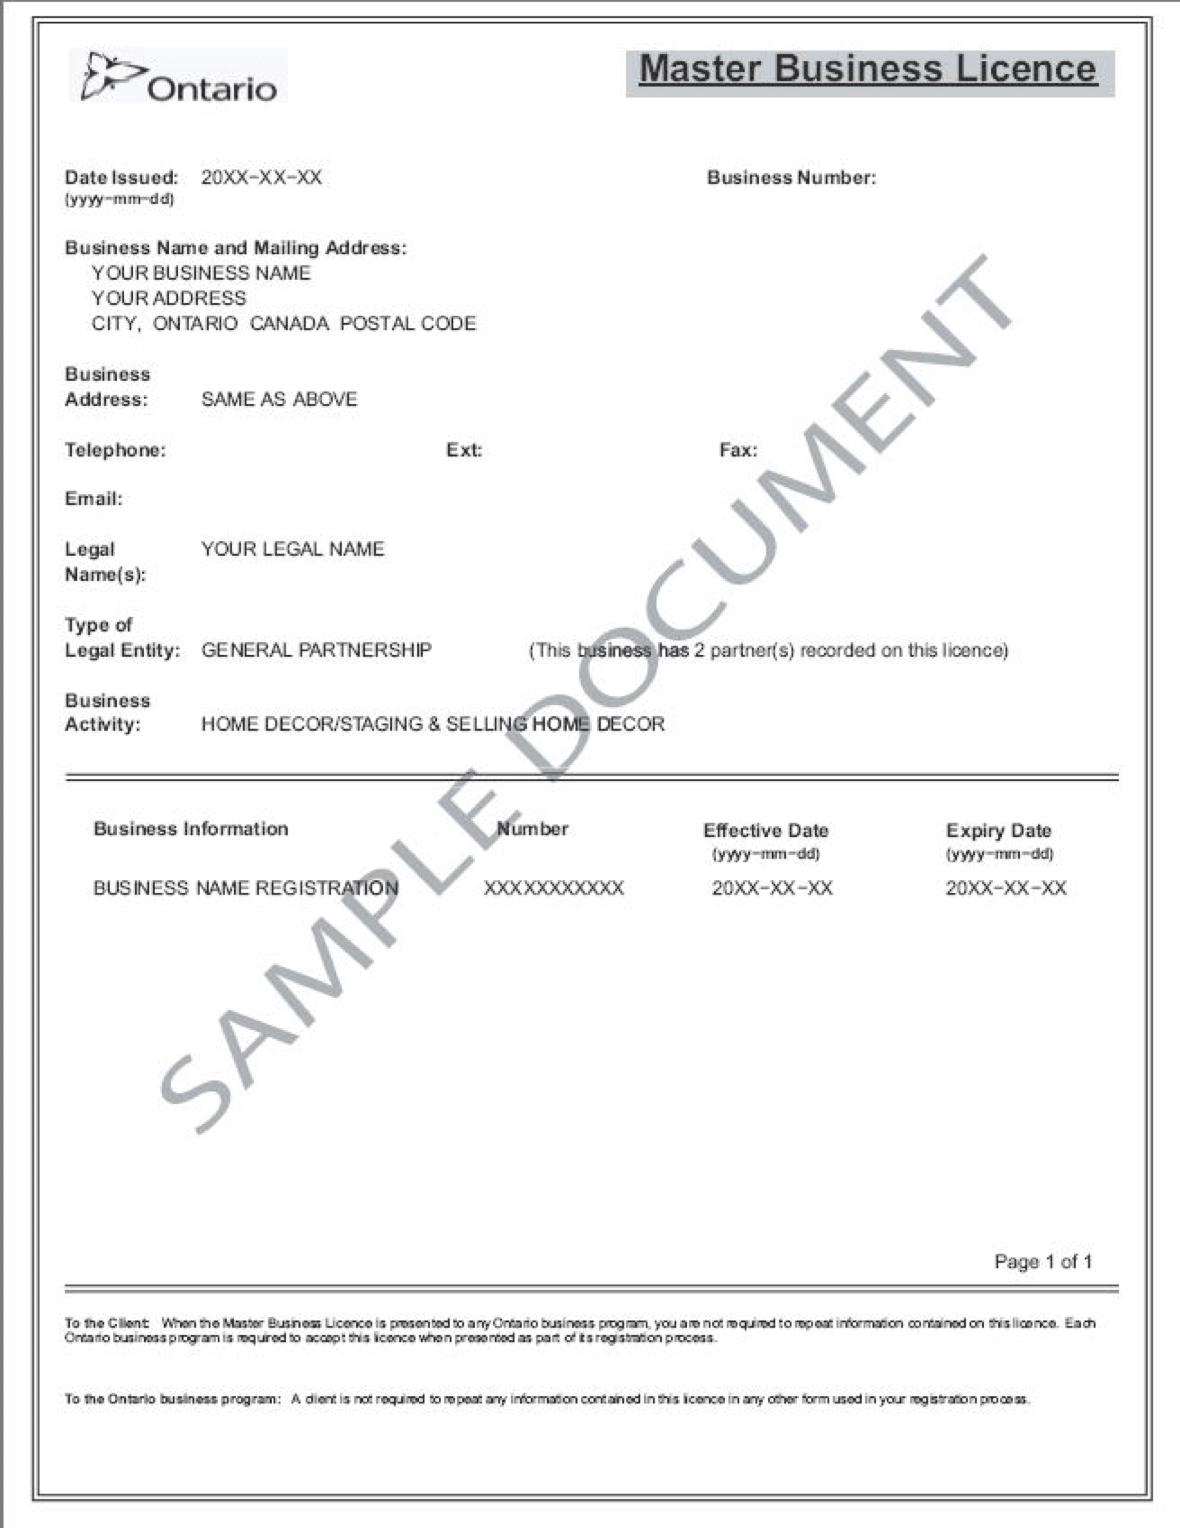 Registering Your Master Business Licence - Ontario Business Central Blog Inside Business Registration License